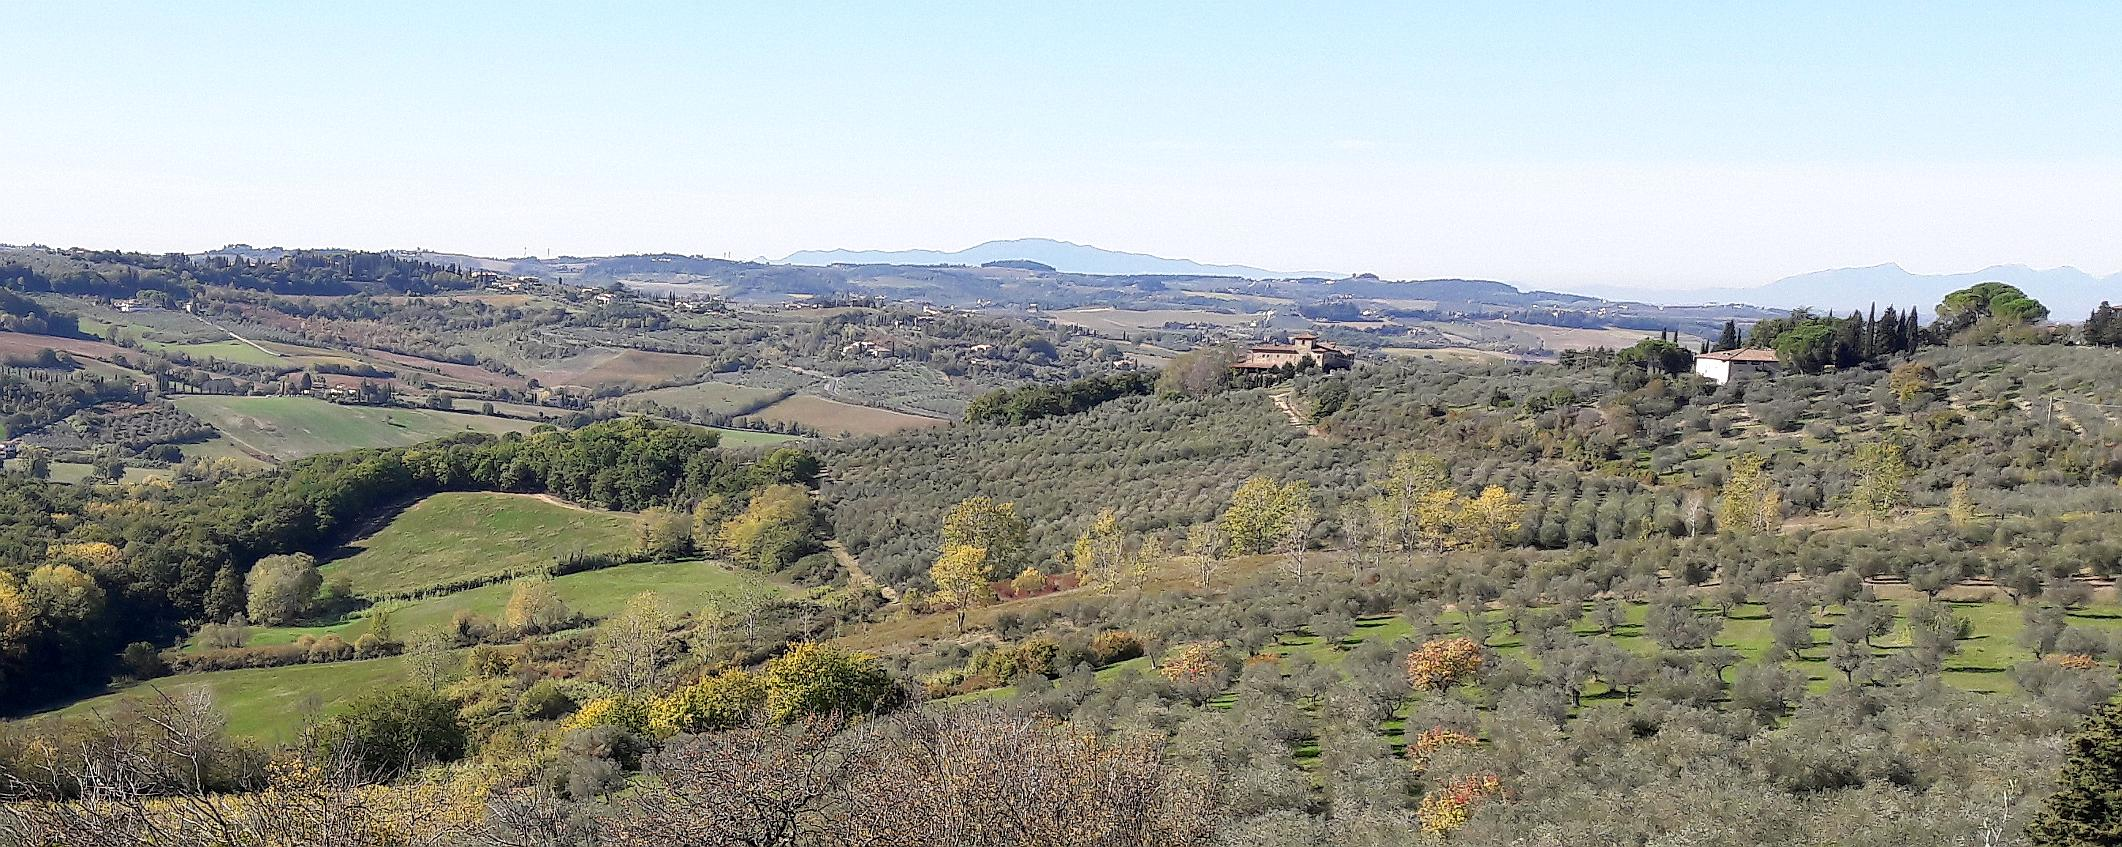 Olivenhain toskana talente olivenoel